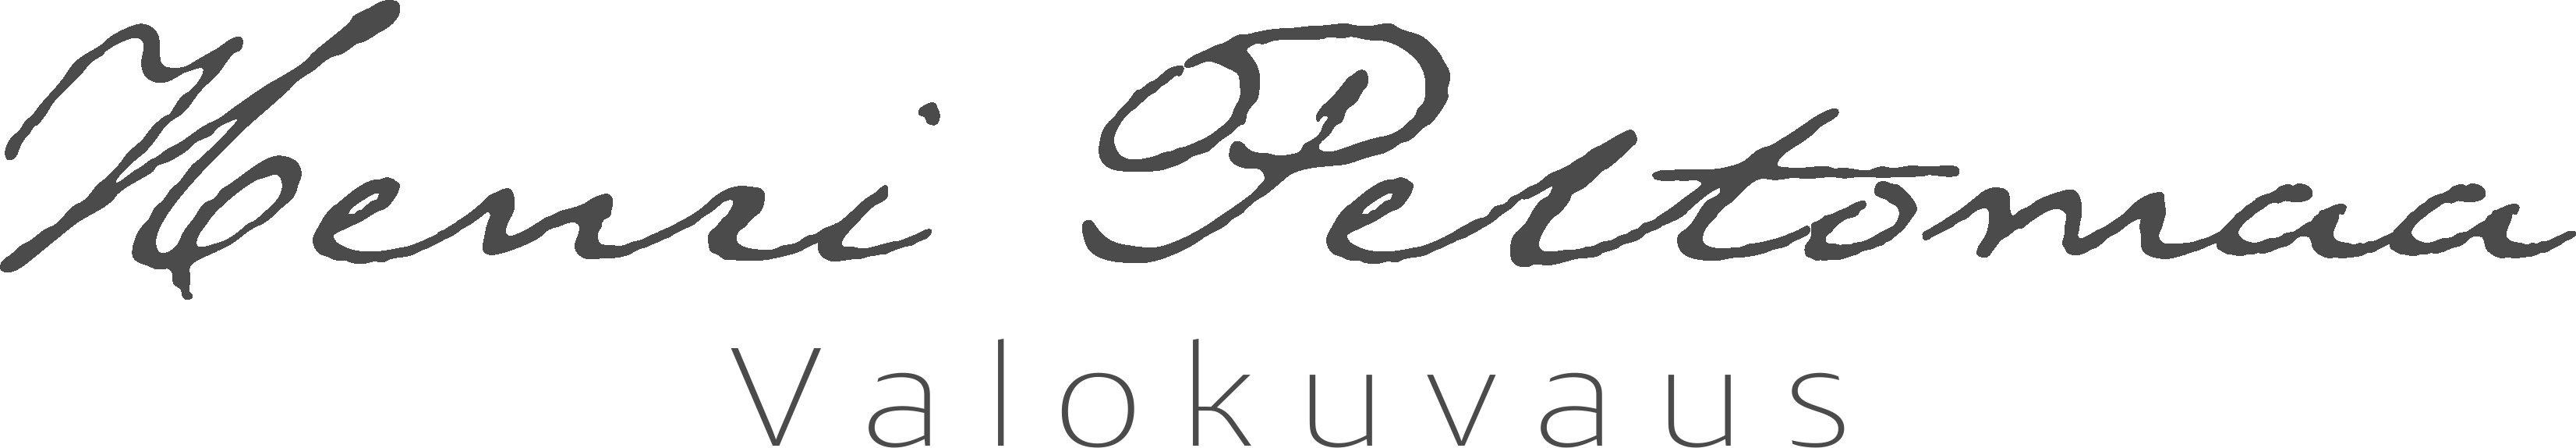 Logo for Valokuvaus Henri Peltomaa • Pori, Finland